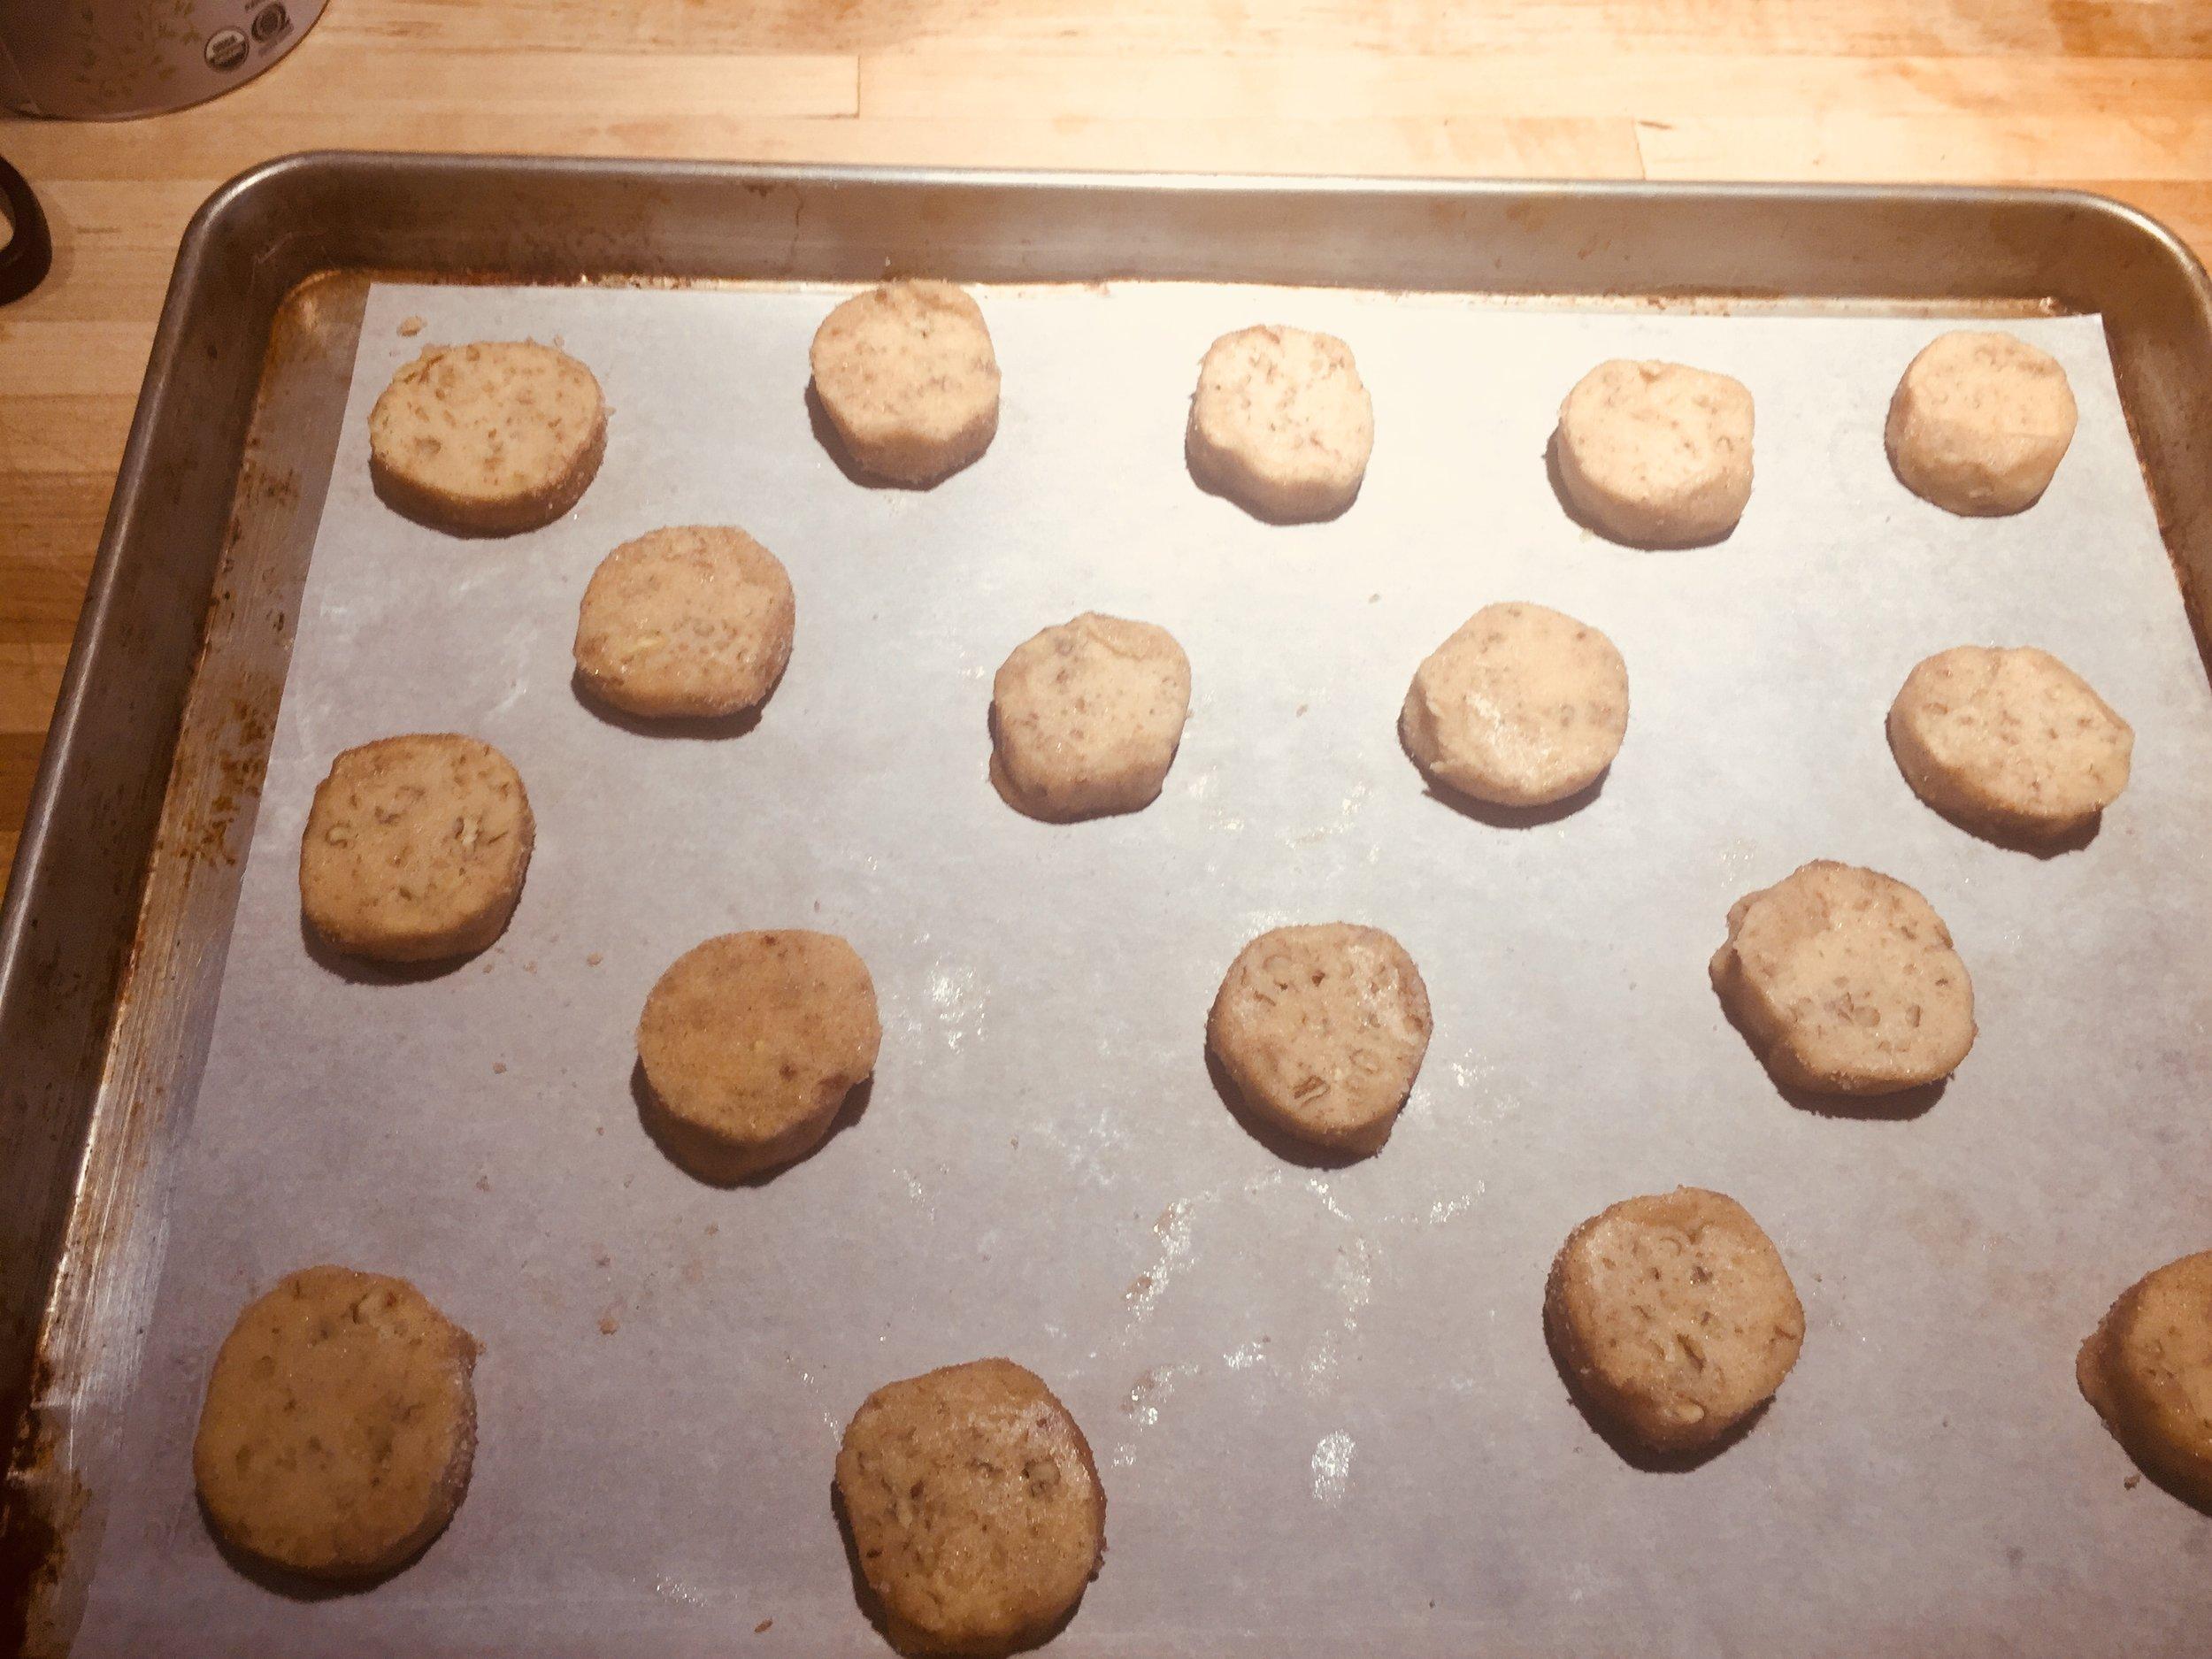 Ready to bake....